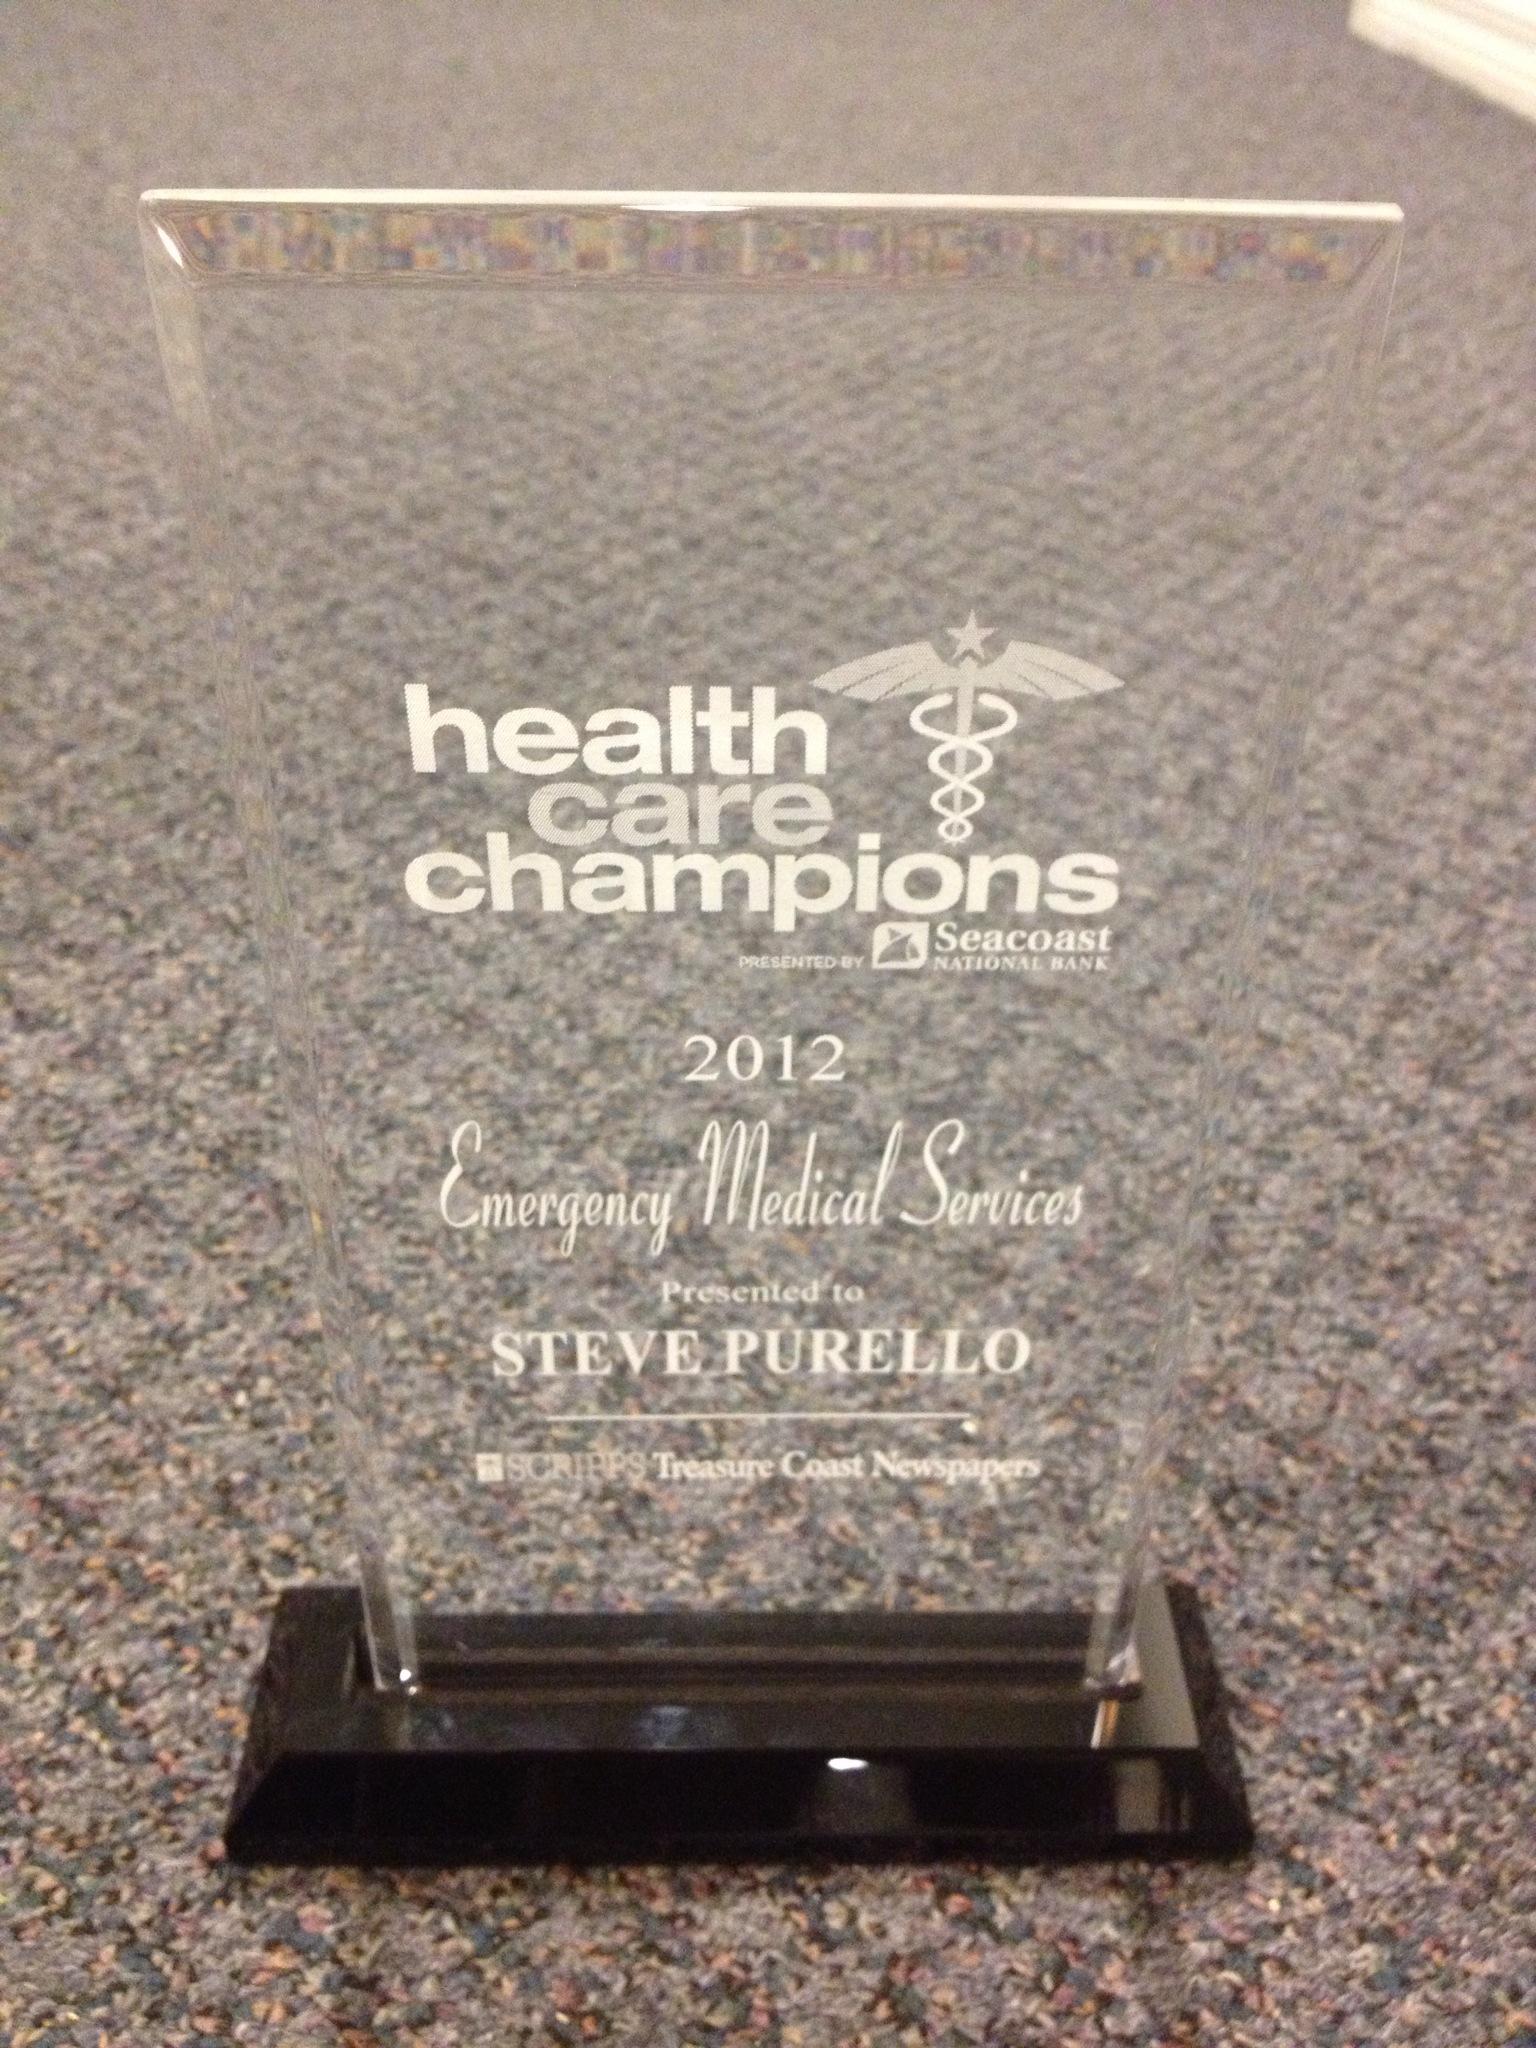 Health Care Champions Award